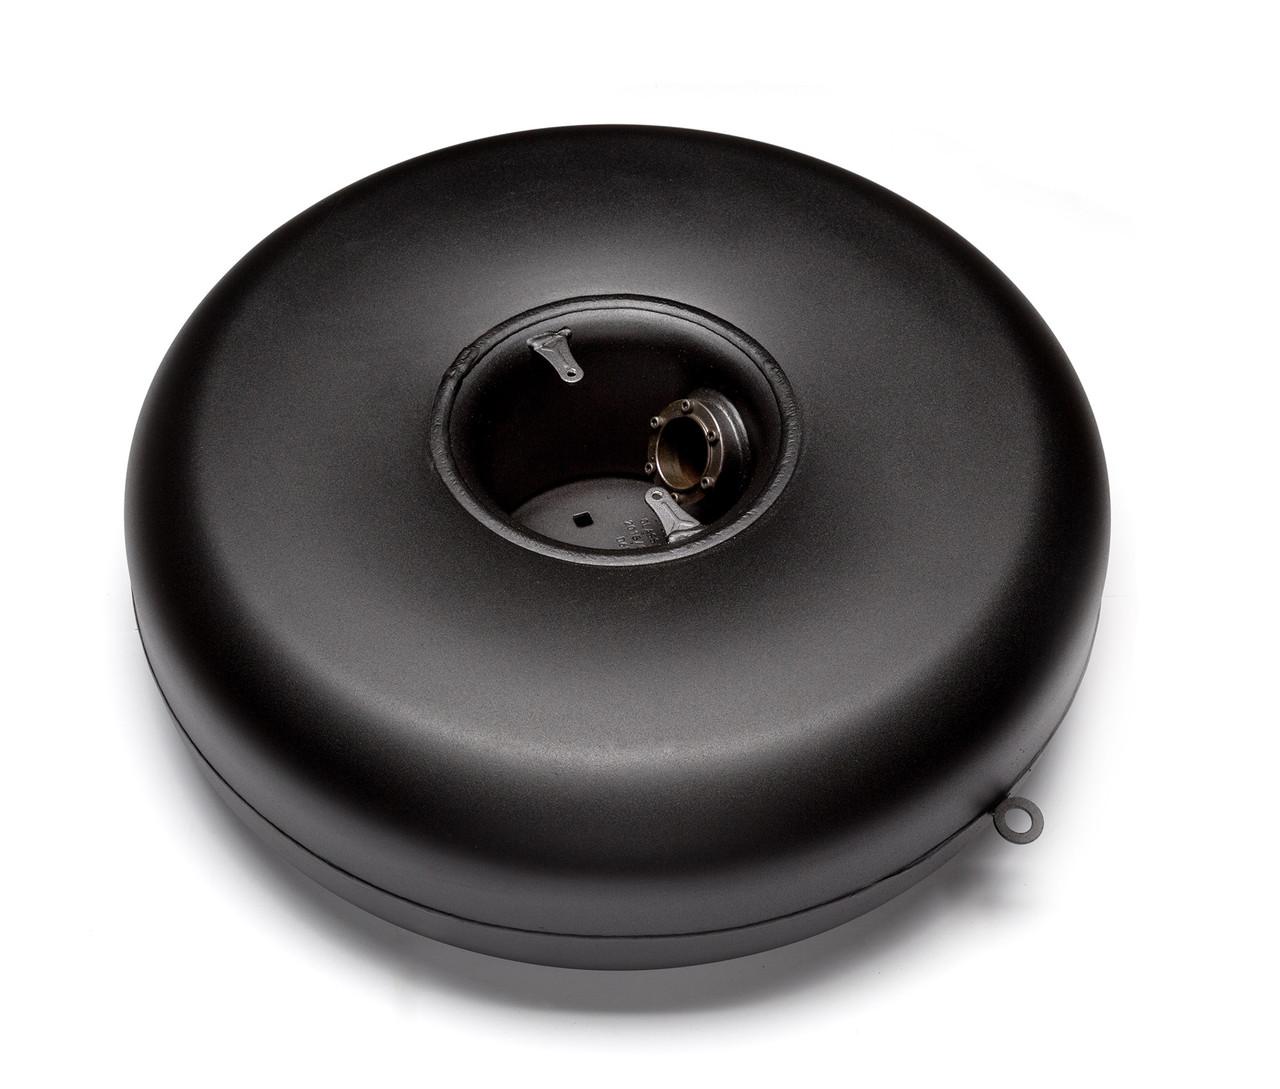 Тороидальный баллон Atiker 69 литров (240х680 мм)